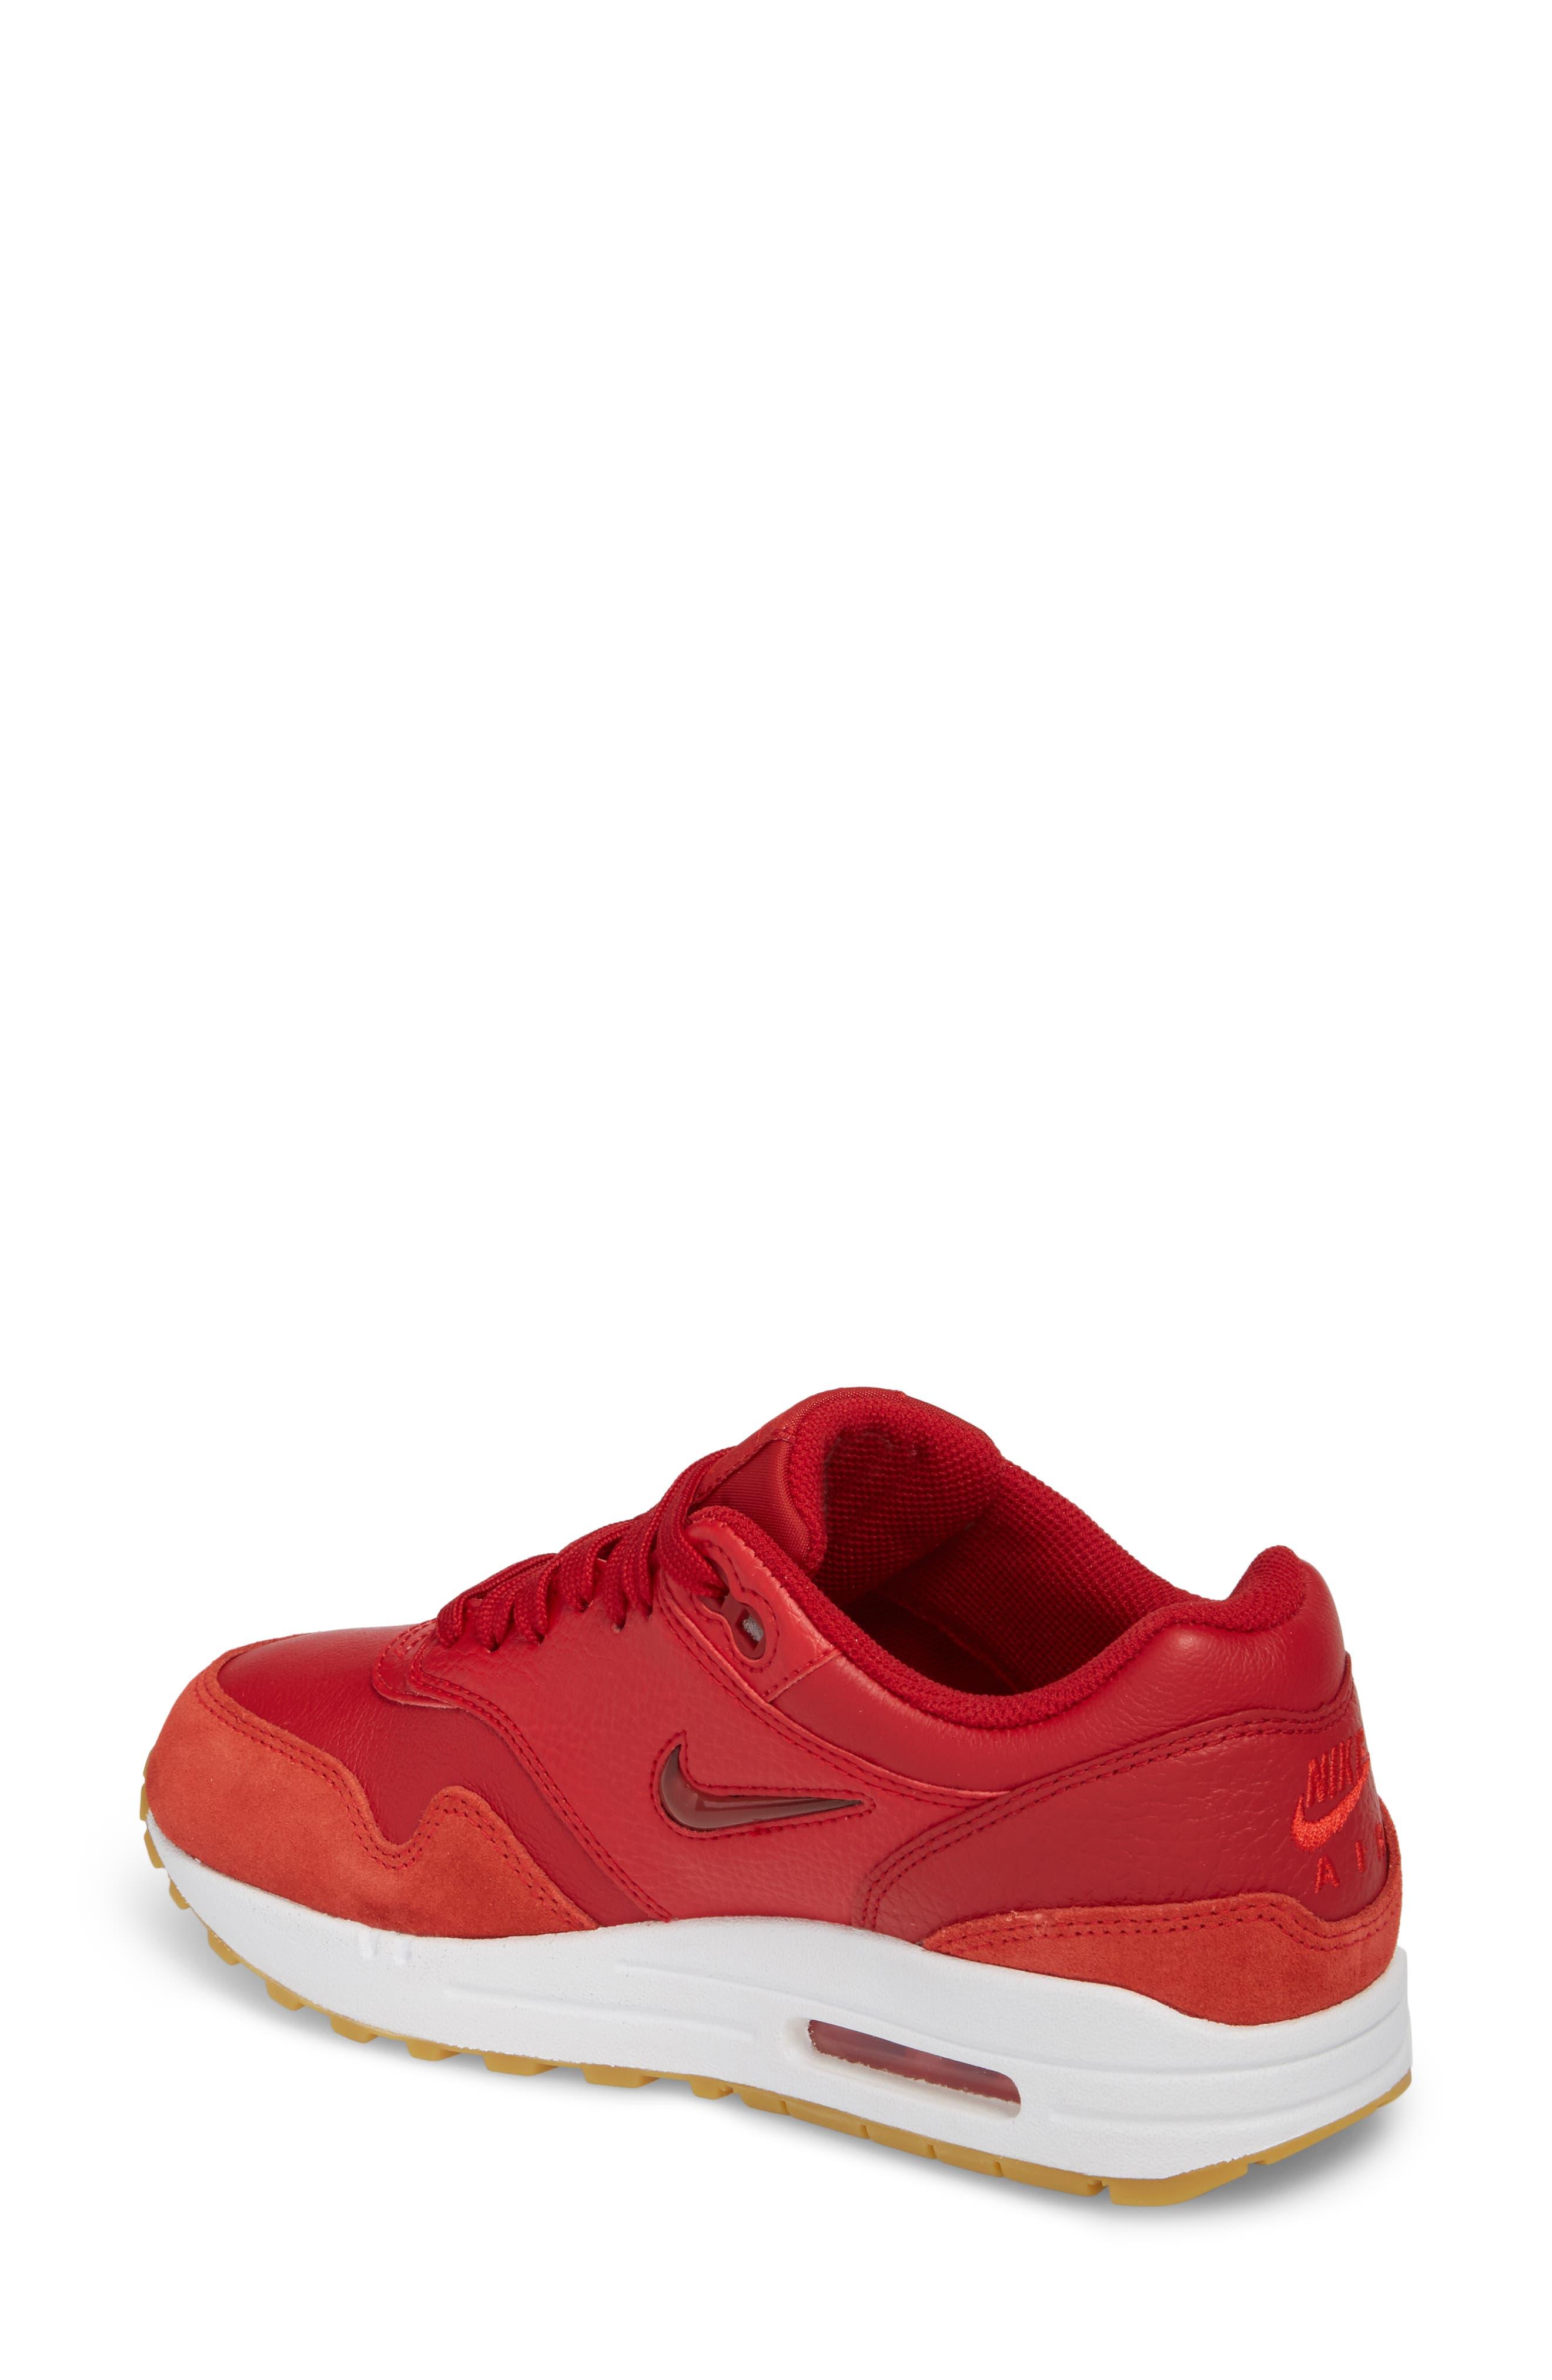 Air Max 1 Premium SC Sneaker,                             Alternate thumbnail 2, color,                             Gym Red/ Gym Red